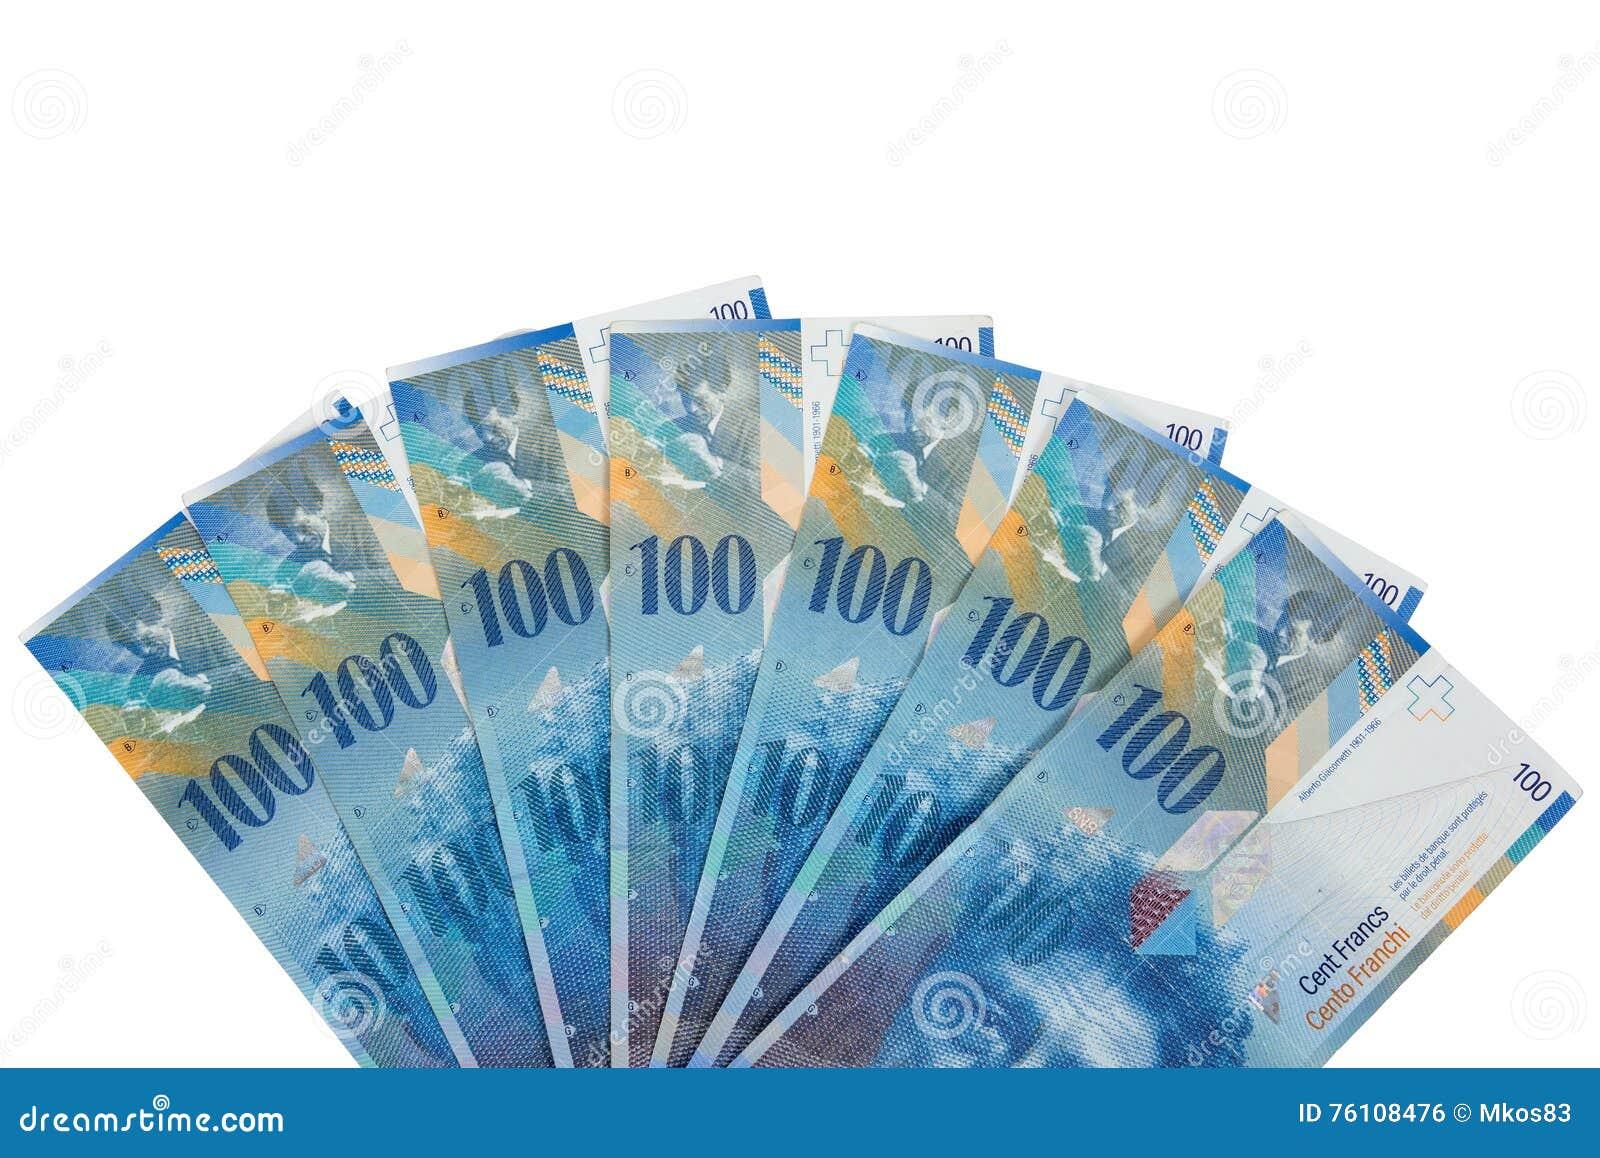 c dulas de 100 francos su os foto de stock imagem de fundo papel 76108476. Black Bedroom Furniture Sets. Home Design Ideas